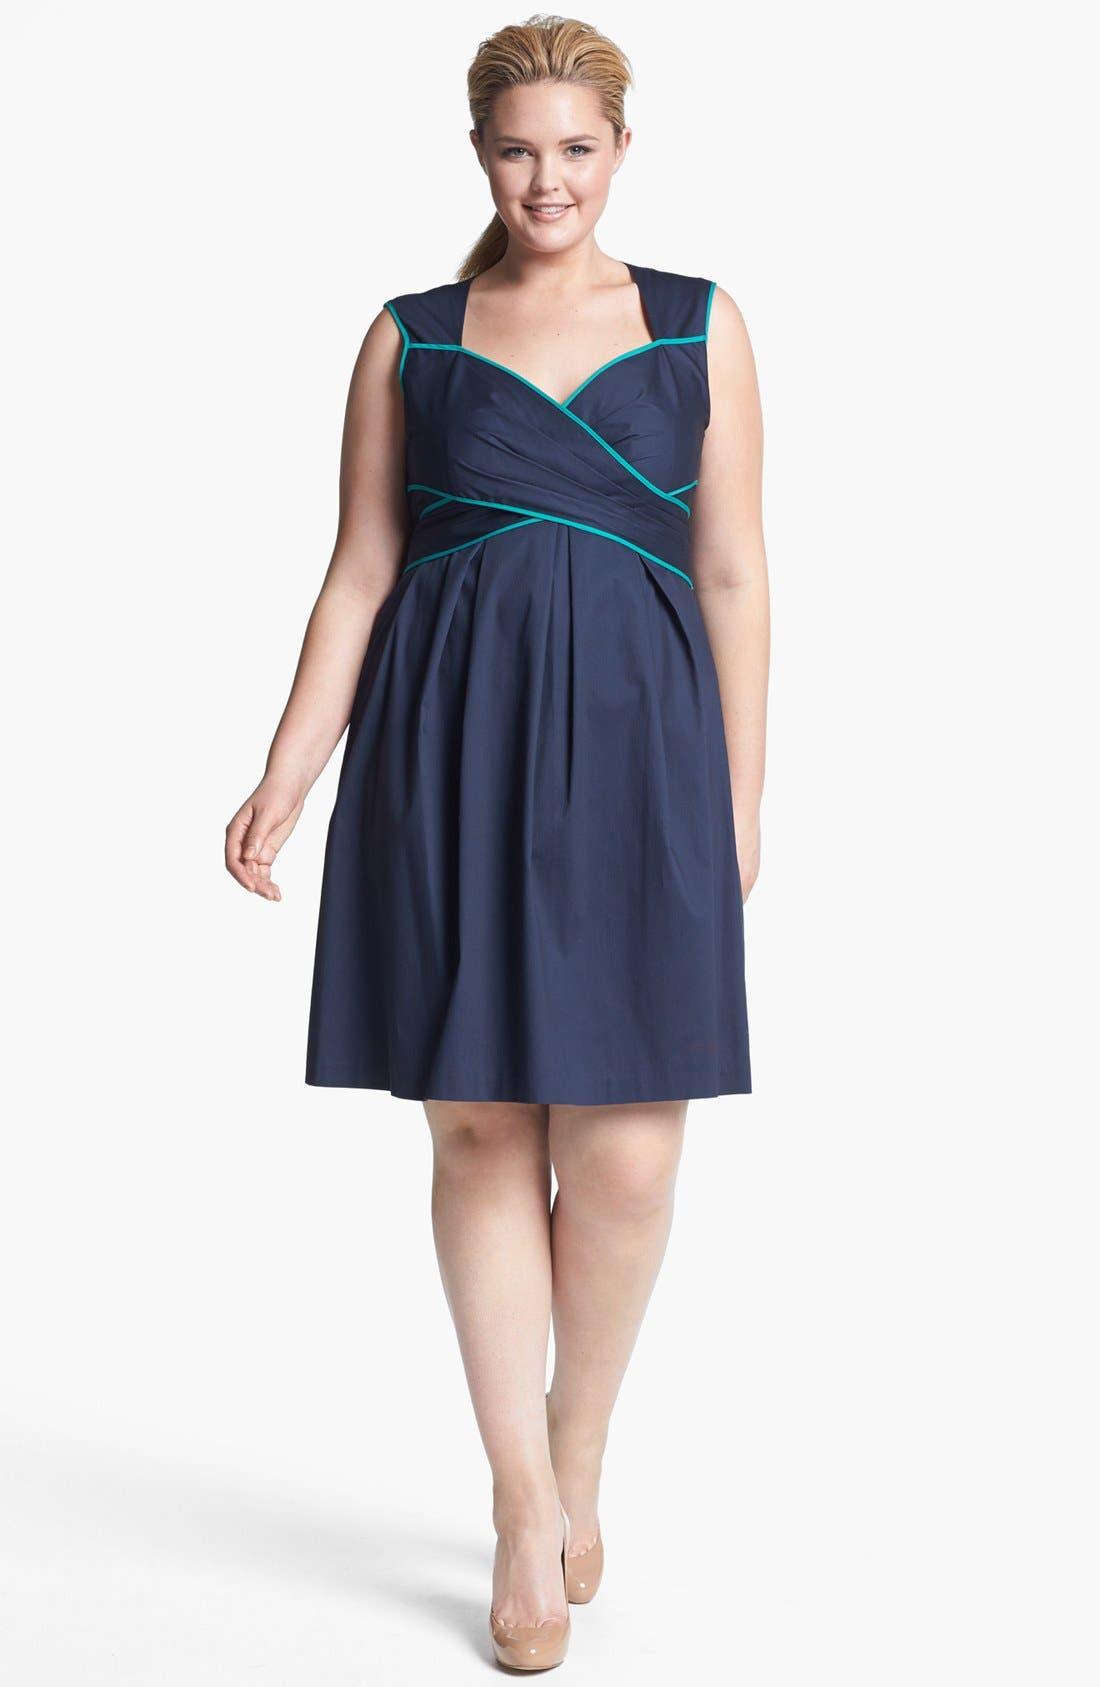 Alternate Image 1 Selected - Jessica Simpson Piped Cotton Sheath Dress (Plus Size)